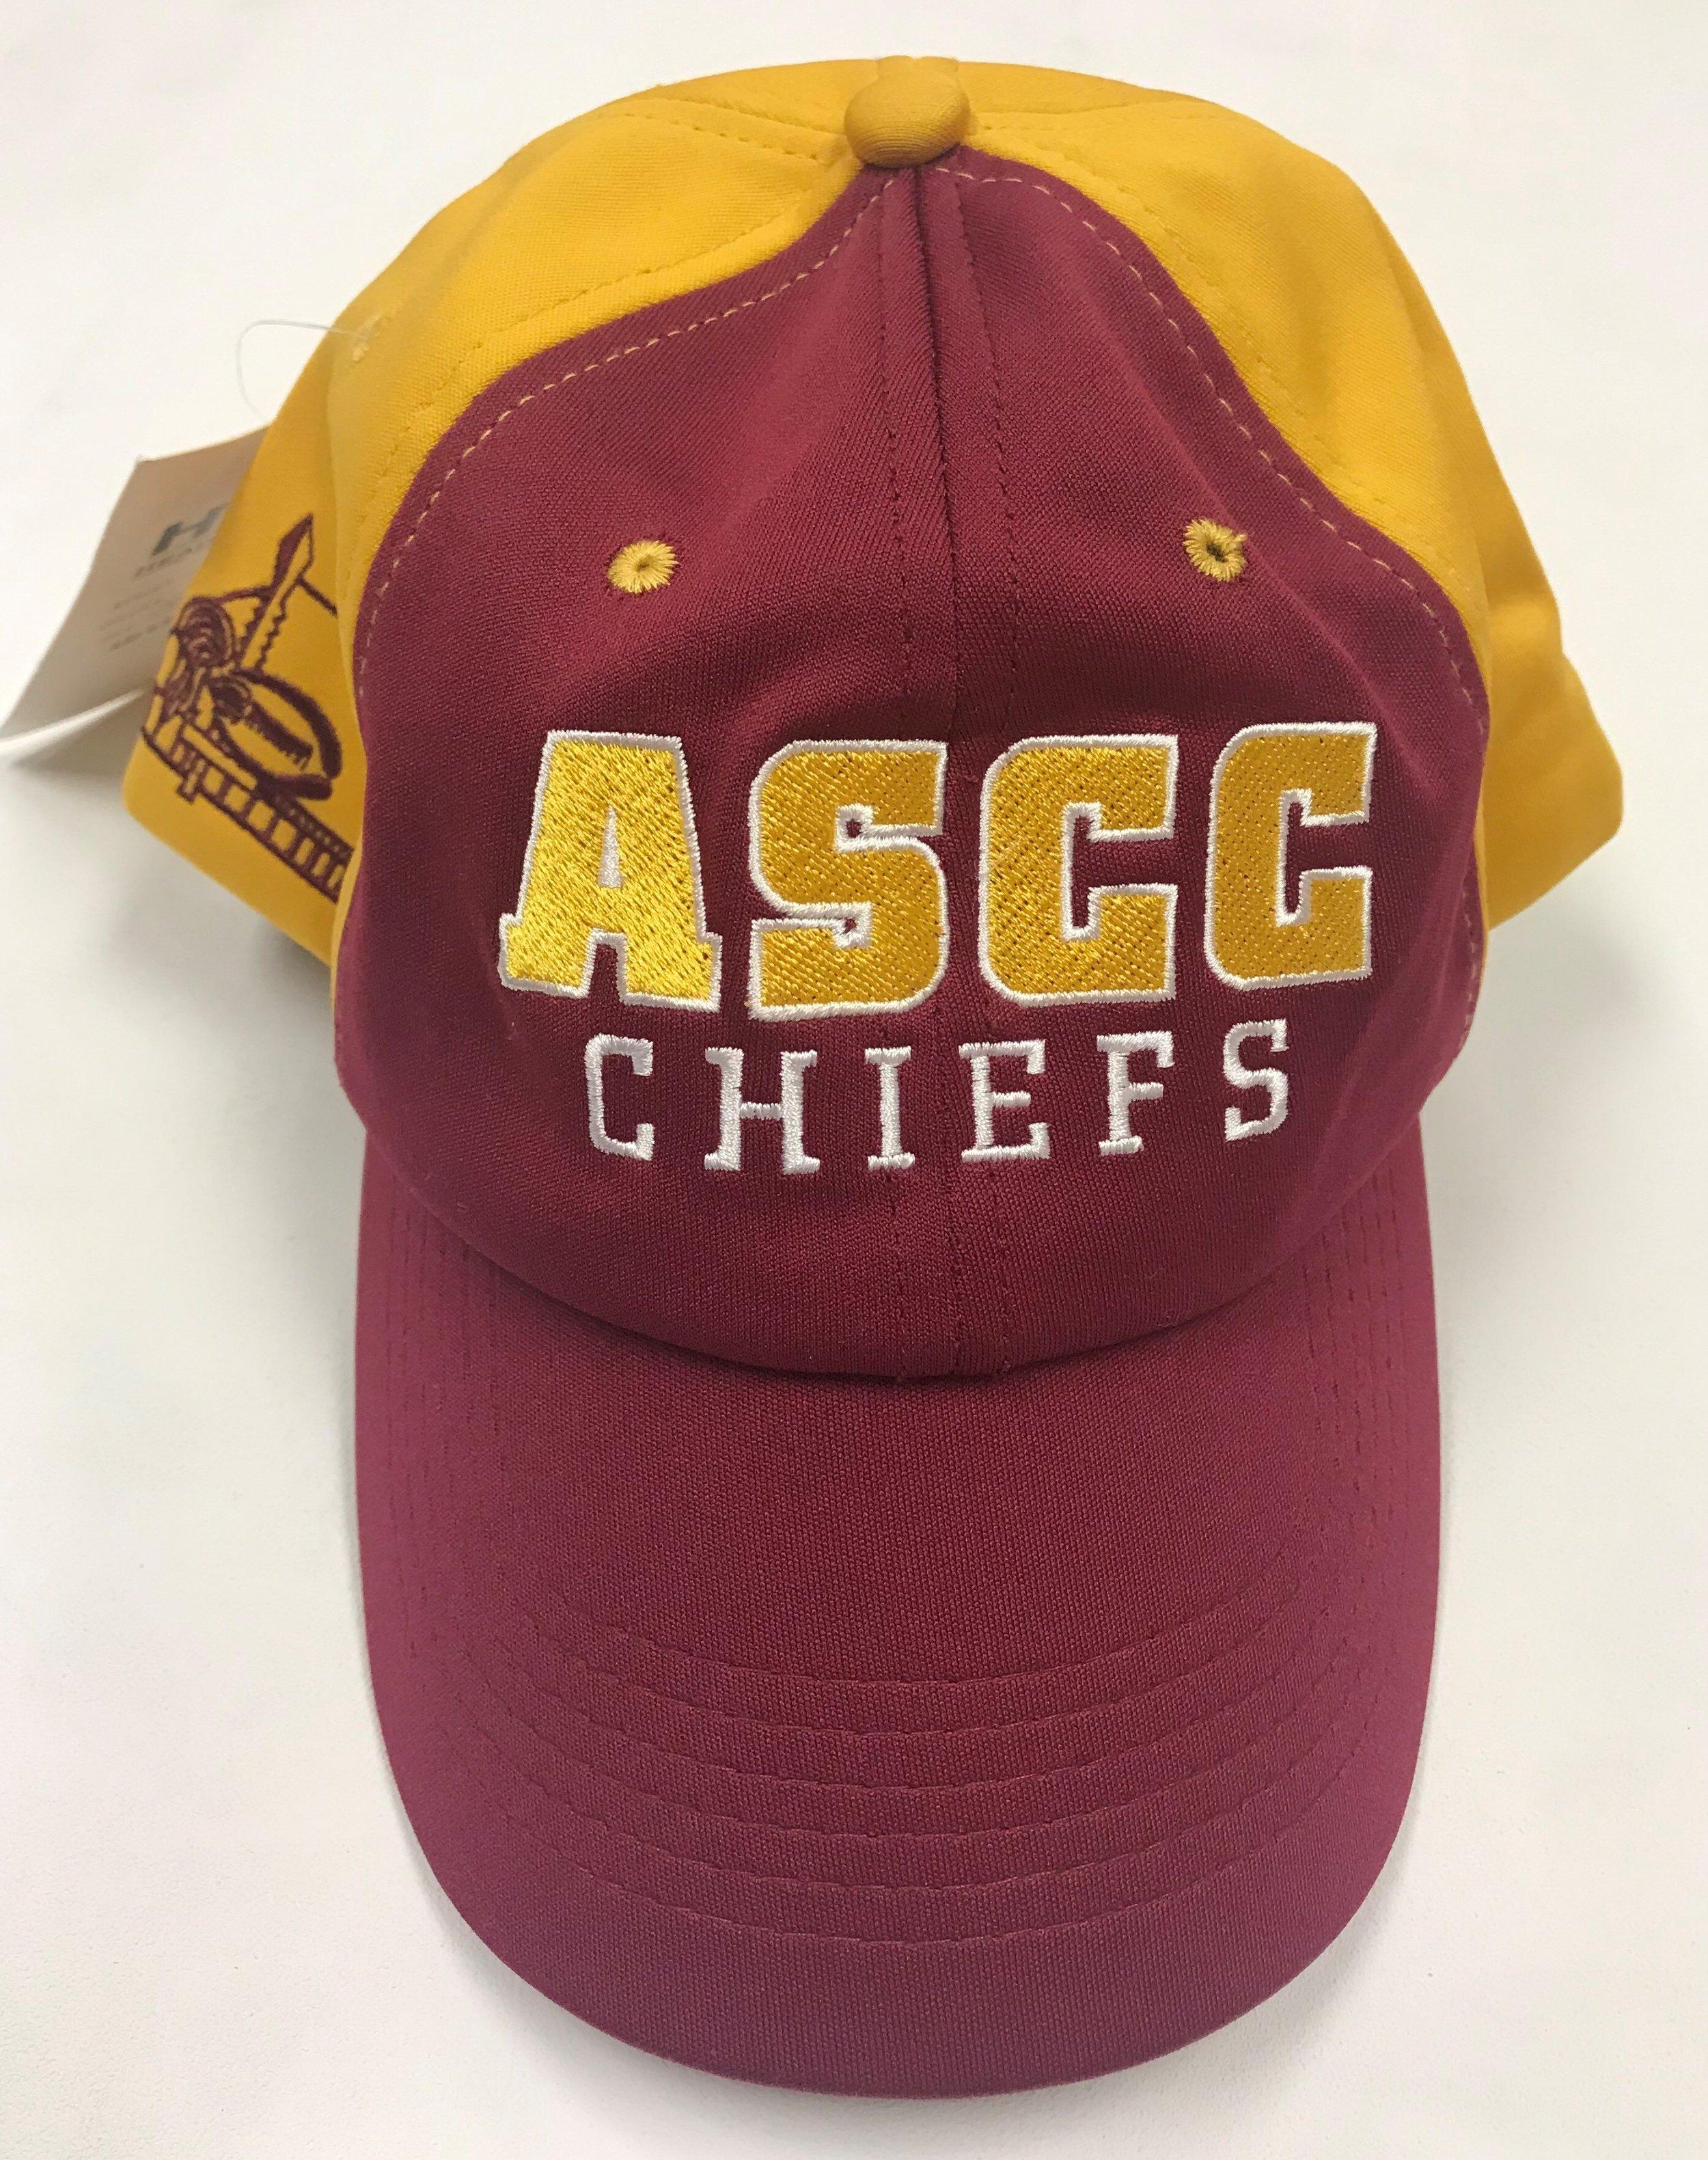 ASCC Chiefs Hat.jpg